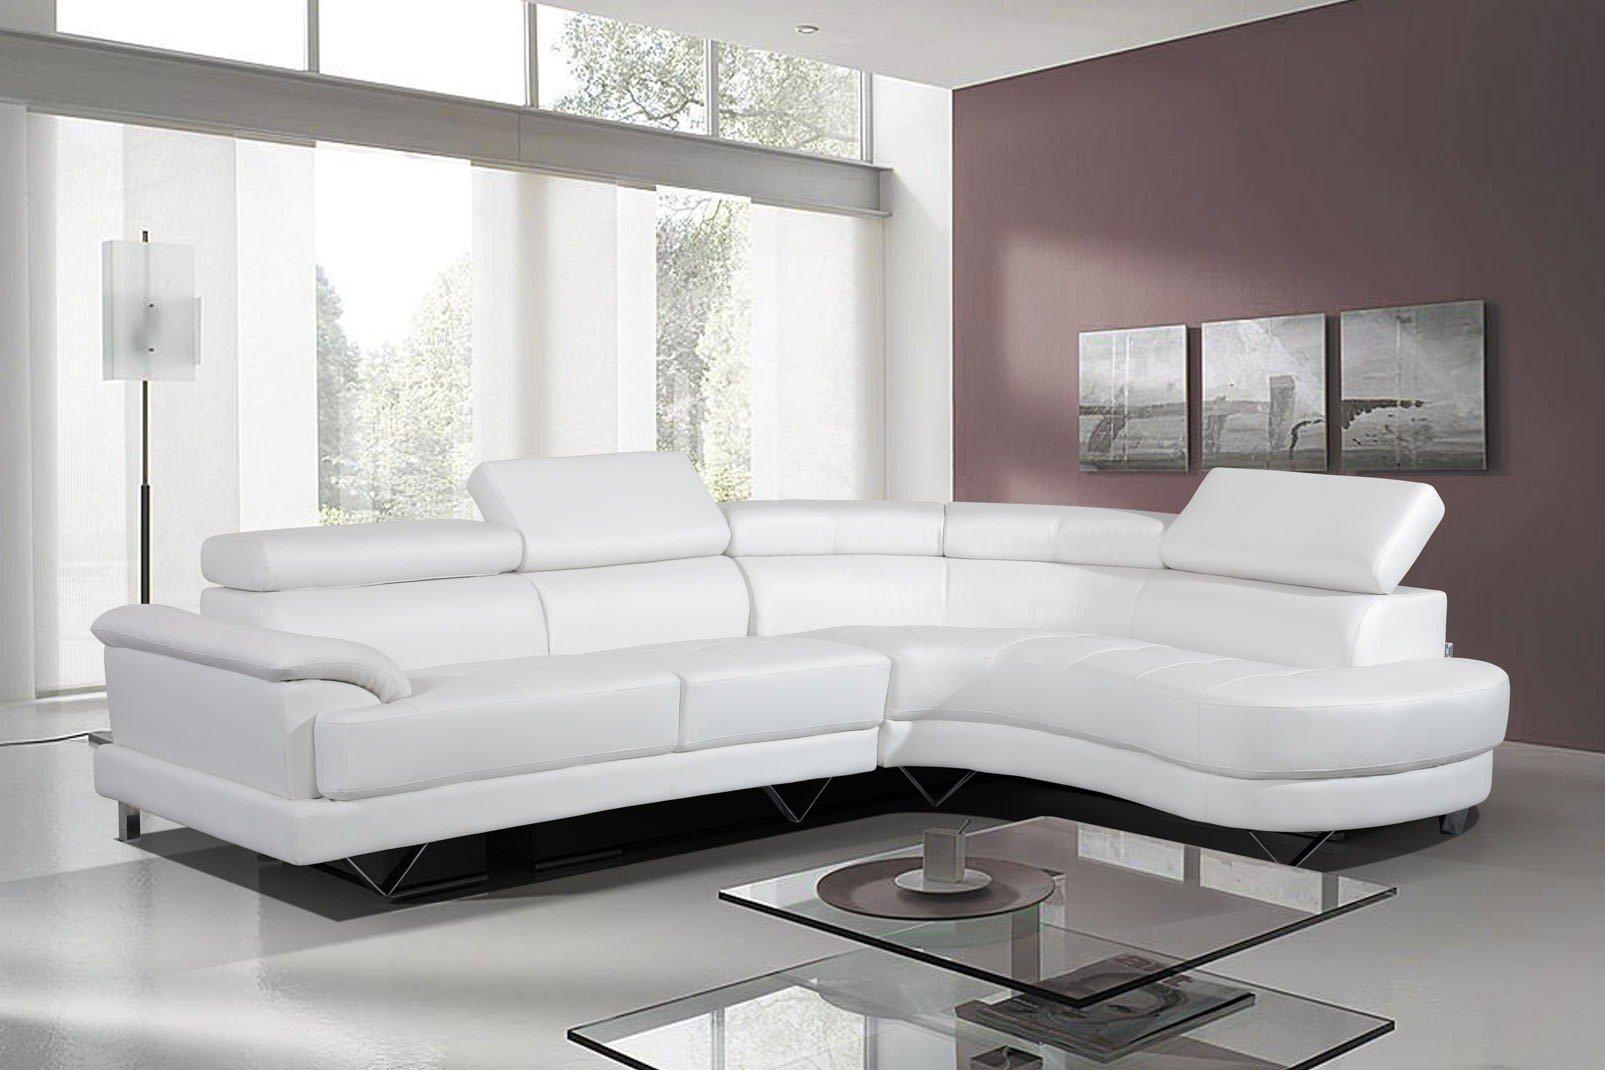 Stunning Leather Corner Sofa White ... white leather corner sofa